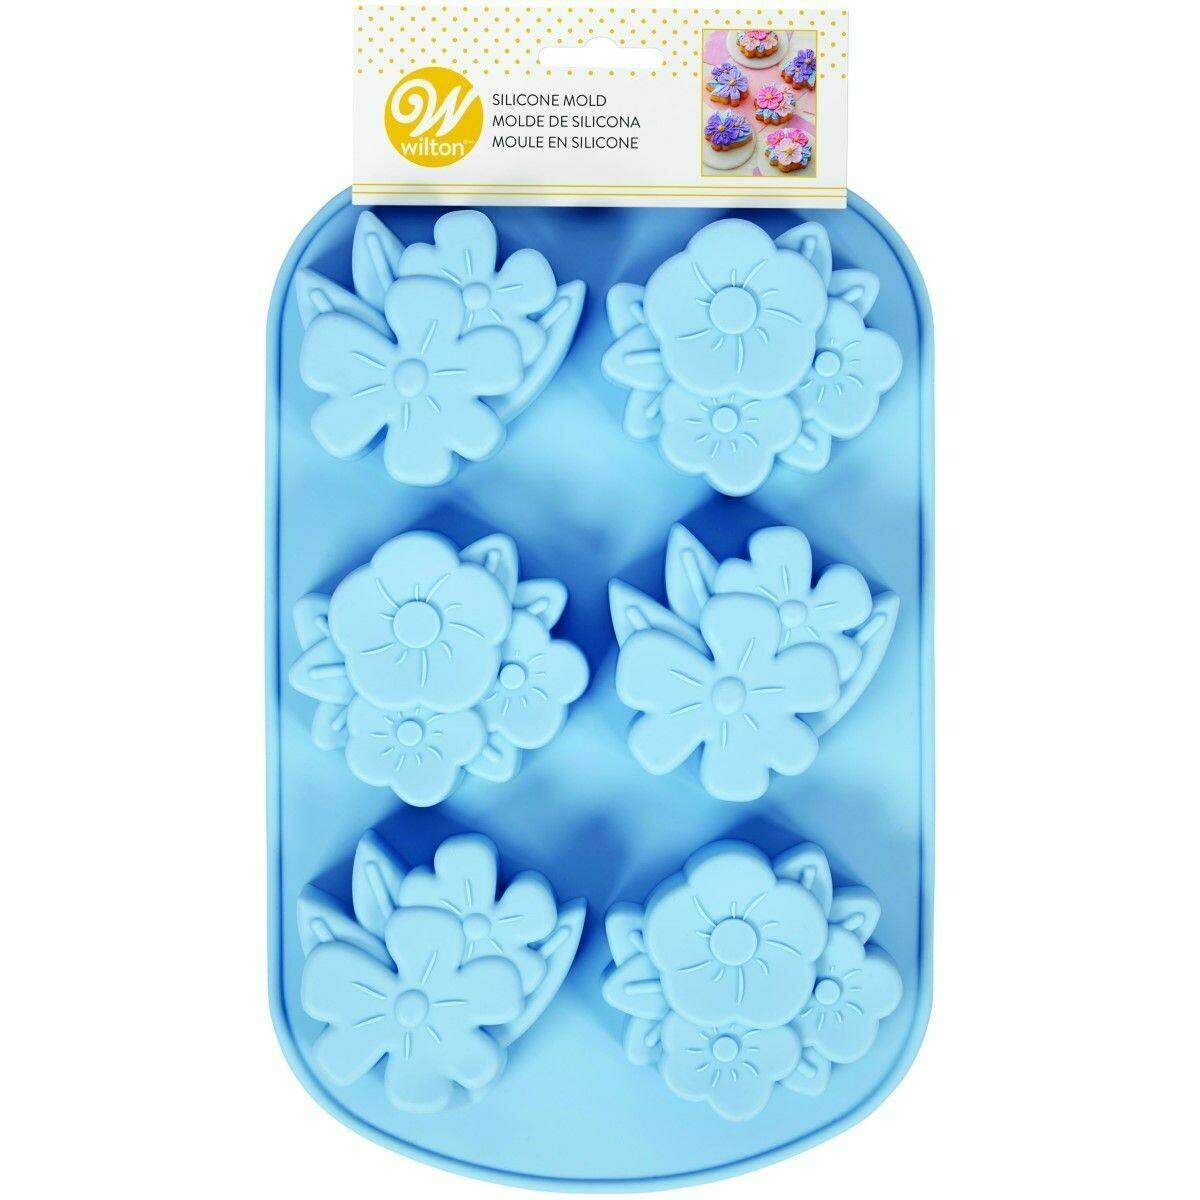 Wilton Silicone Baking Mould -FLORAL - Φόρμα Ψησίματος Σιλικόνης Λουλούδια